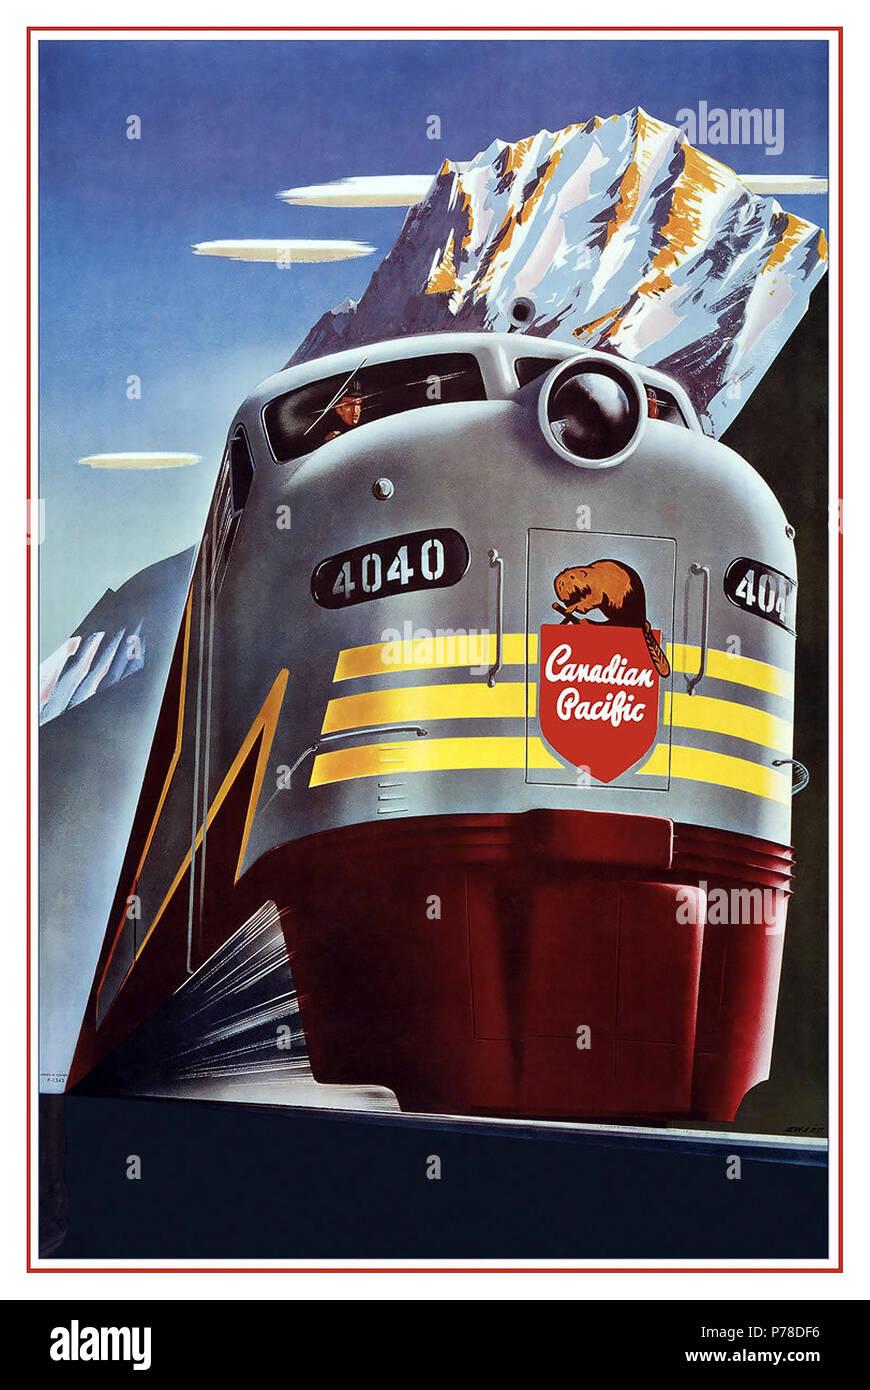 Jahrgang 1950 Rail Poster Grafik Canadian Pacific Railway Company-Diesellok Zug - Logo Biber Schild - Vintage Railroad Reisen Poster von Peter Ewart c. 1950 Werbung Transport Werbung Bahn Werbung Canadian Pacific Railway Canadian Pacific Zug Stockbild